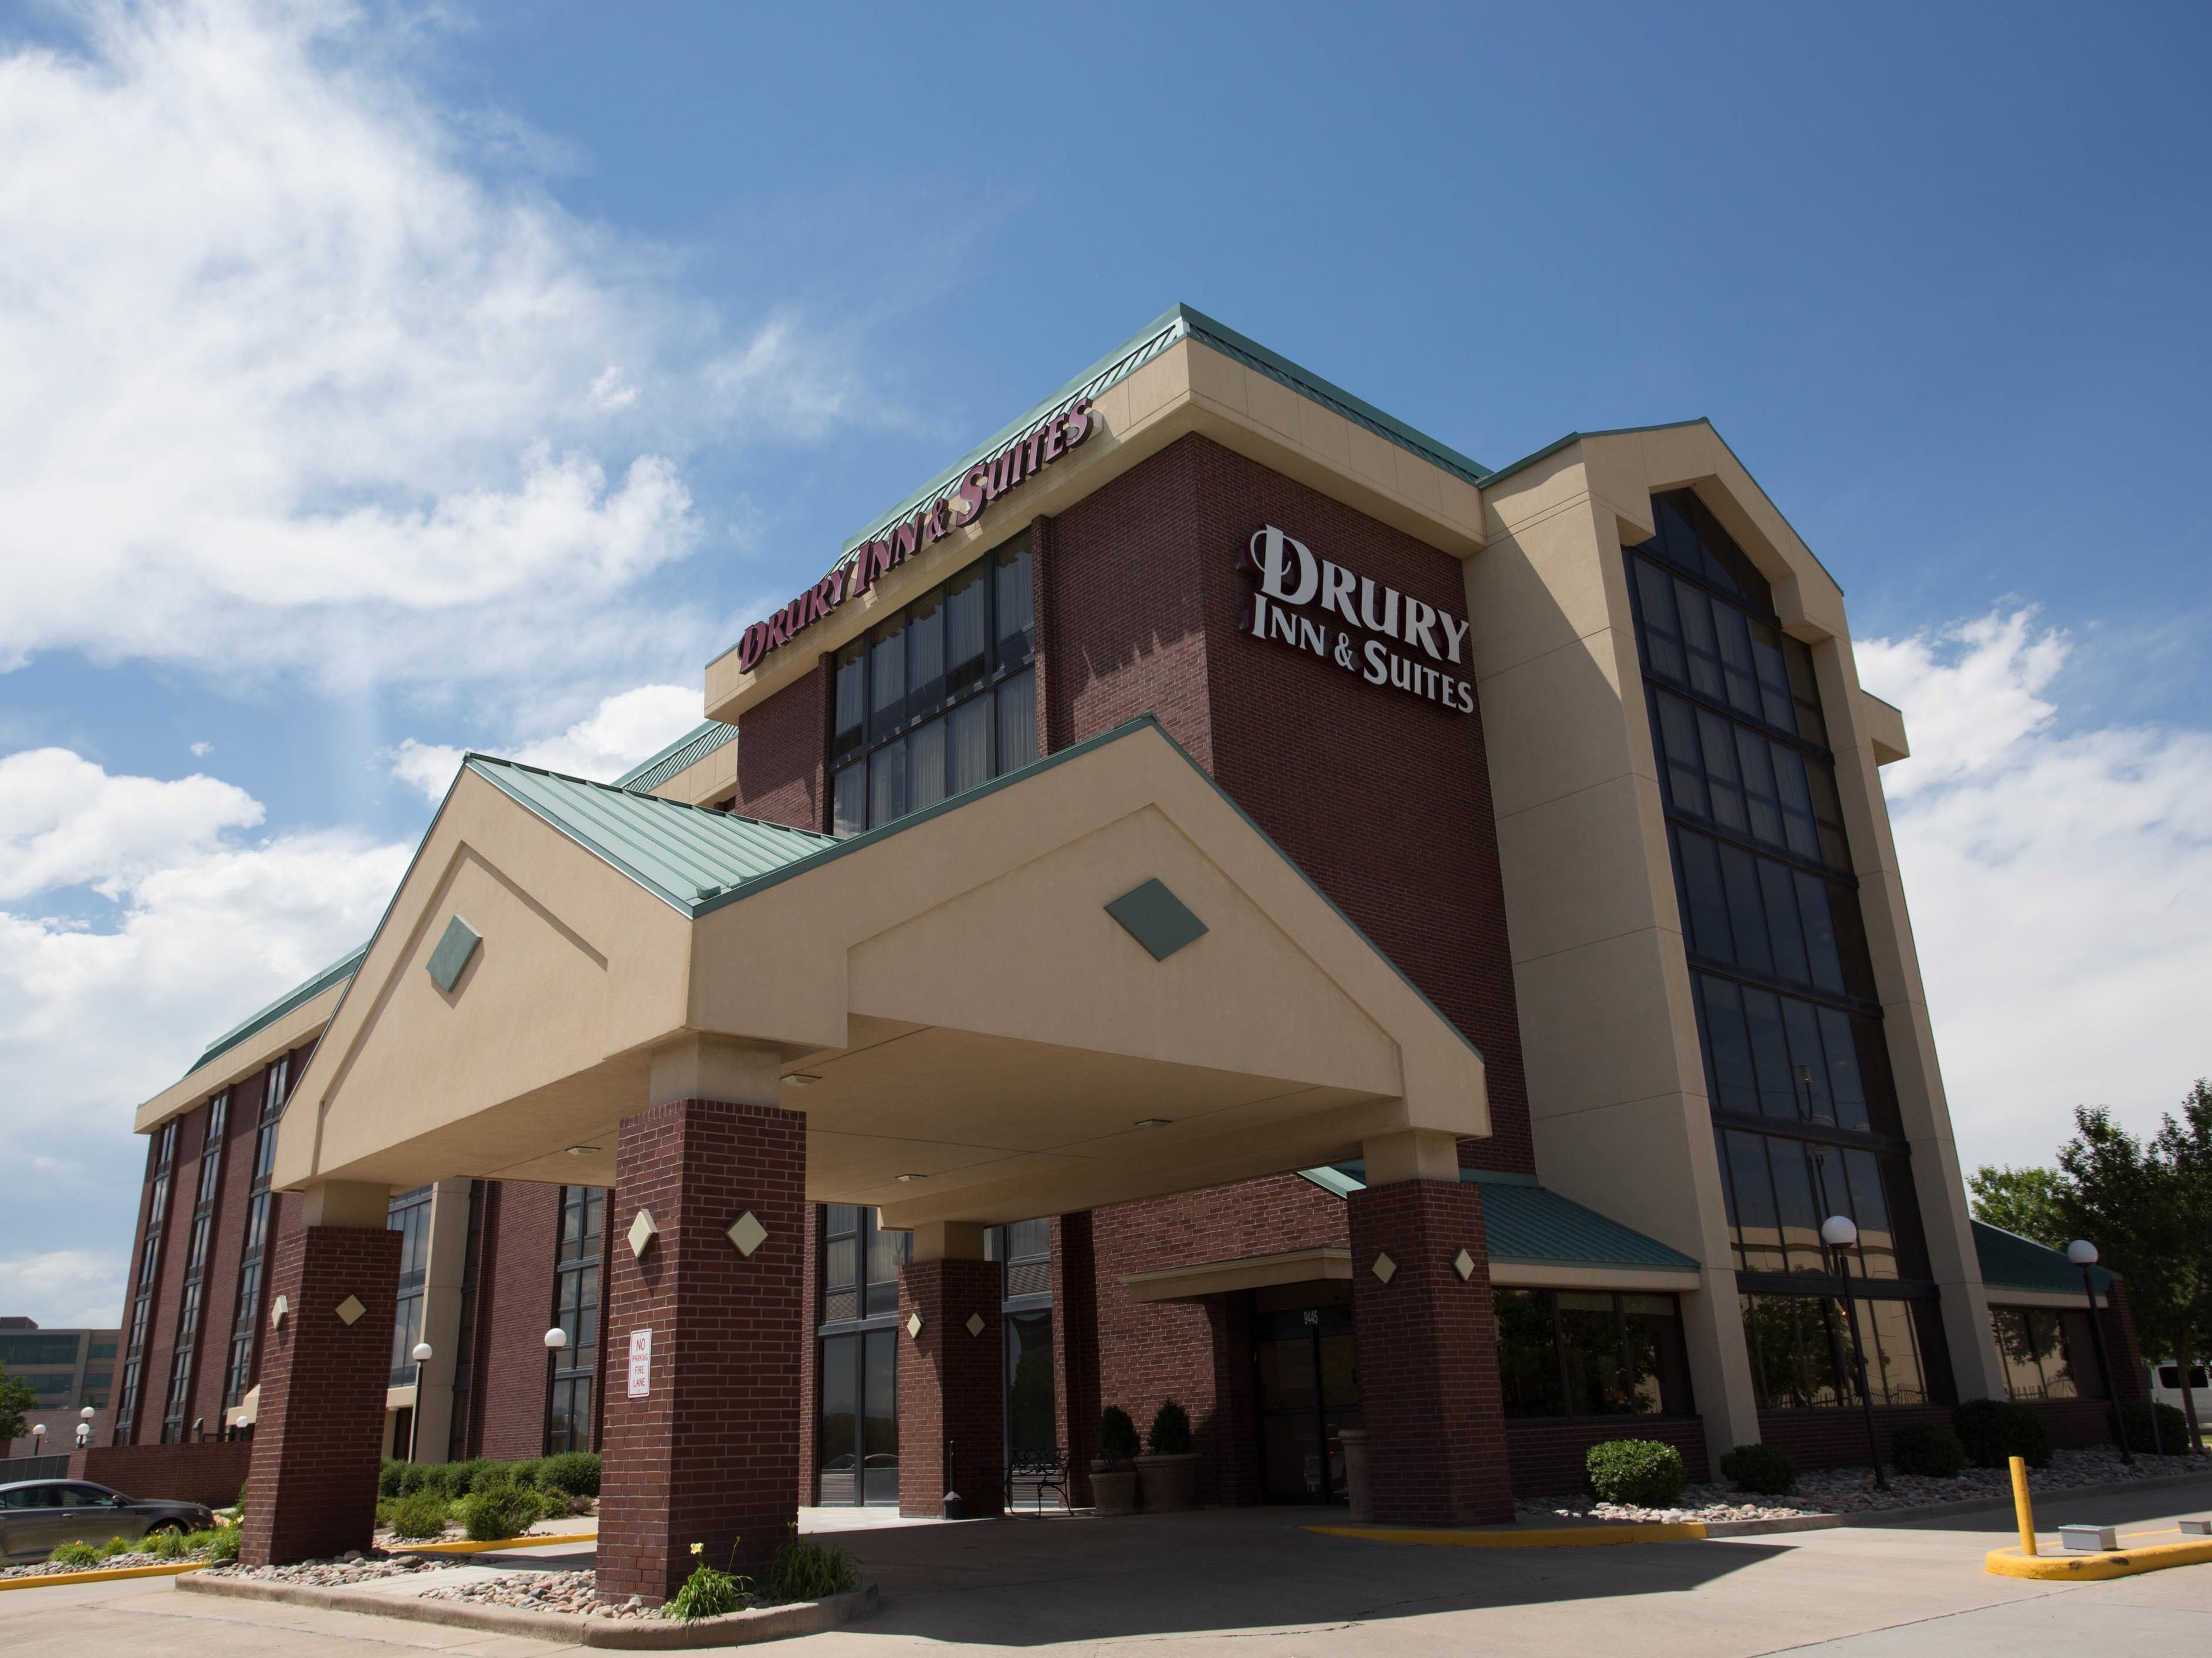 Centennial Co Drury Inn And Suites Denver Tech Center United